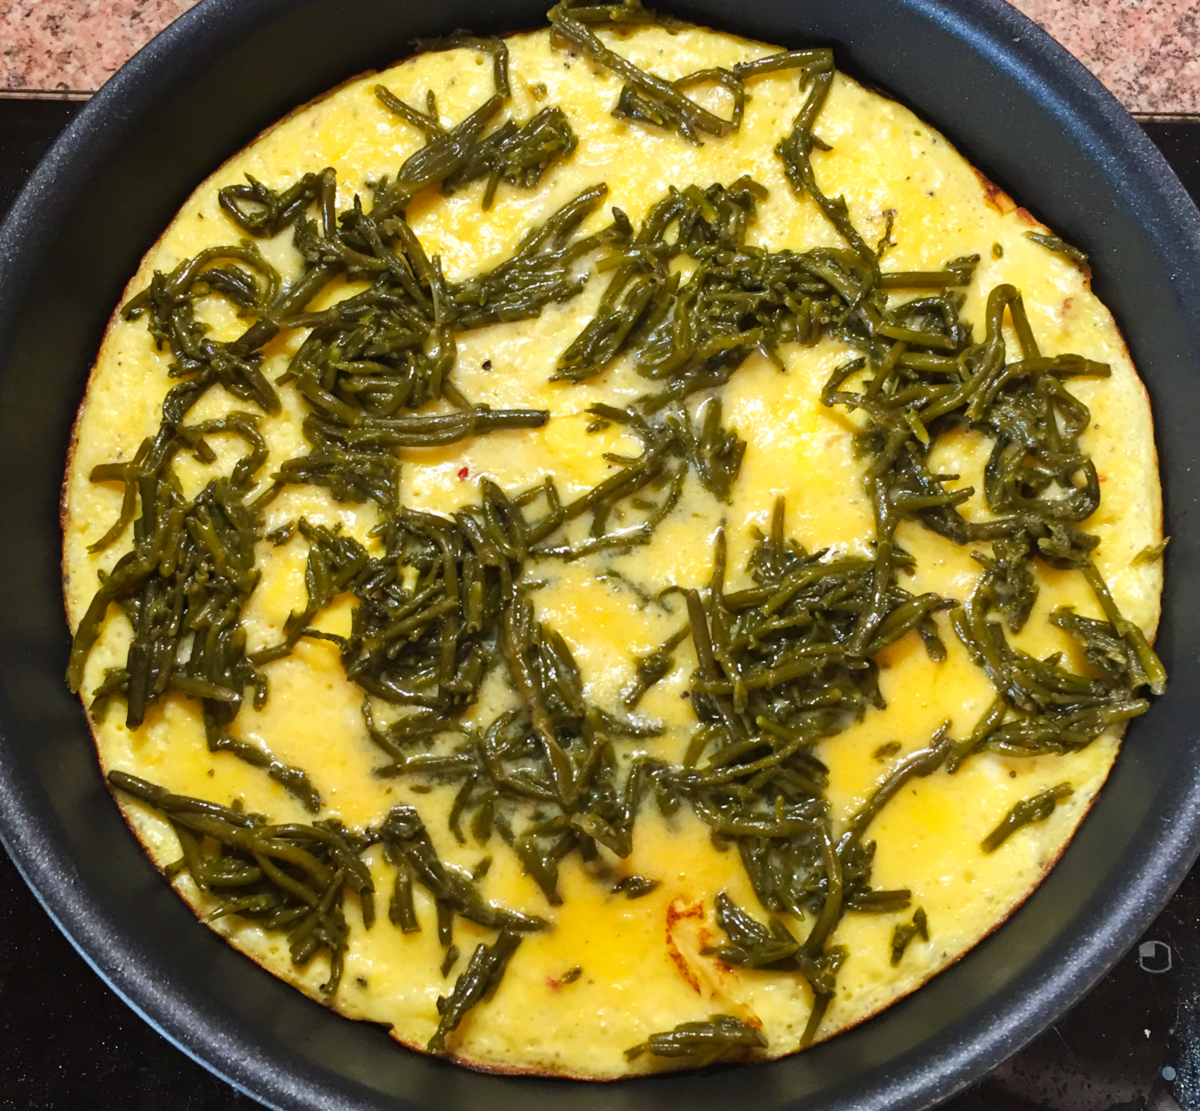 IMG 4122 - Omelette à la salicorne